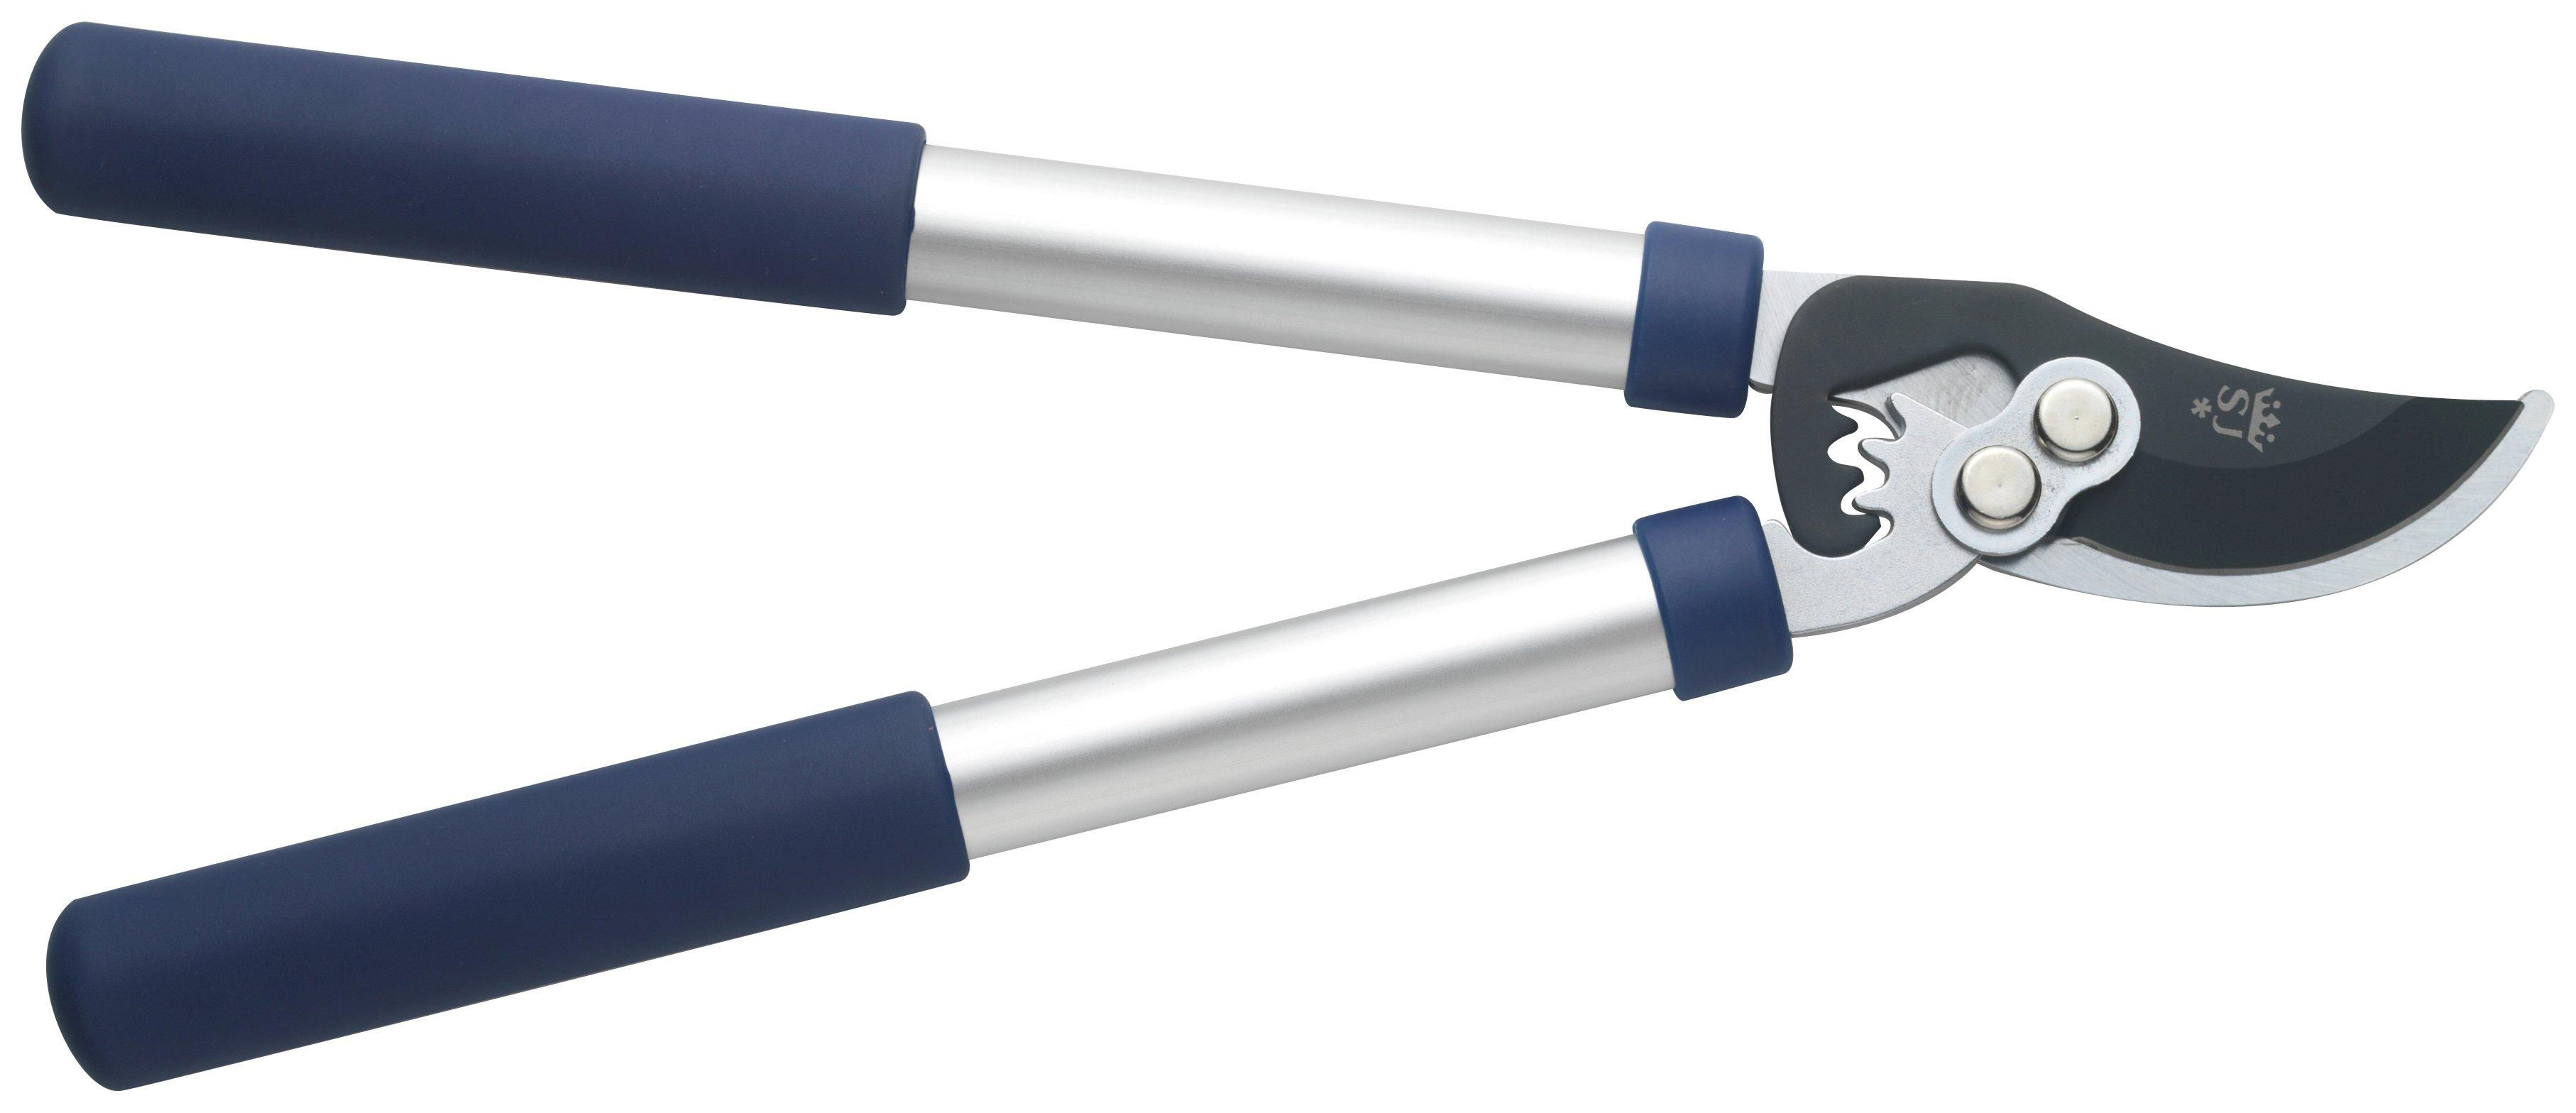 Spear & Jackson Razorsharp Geared Mini Bypass Lopper